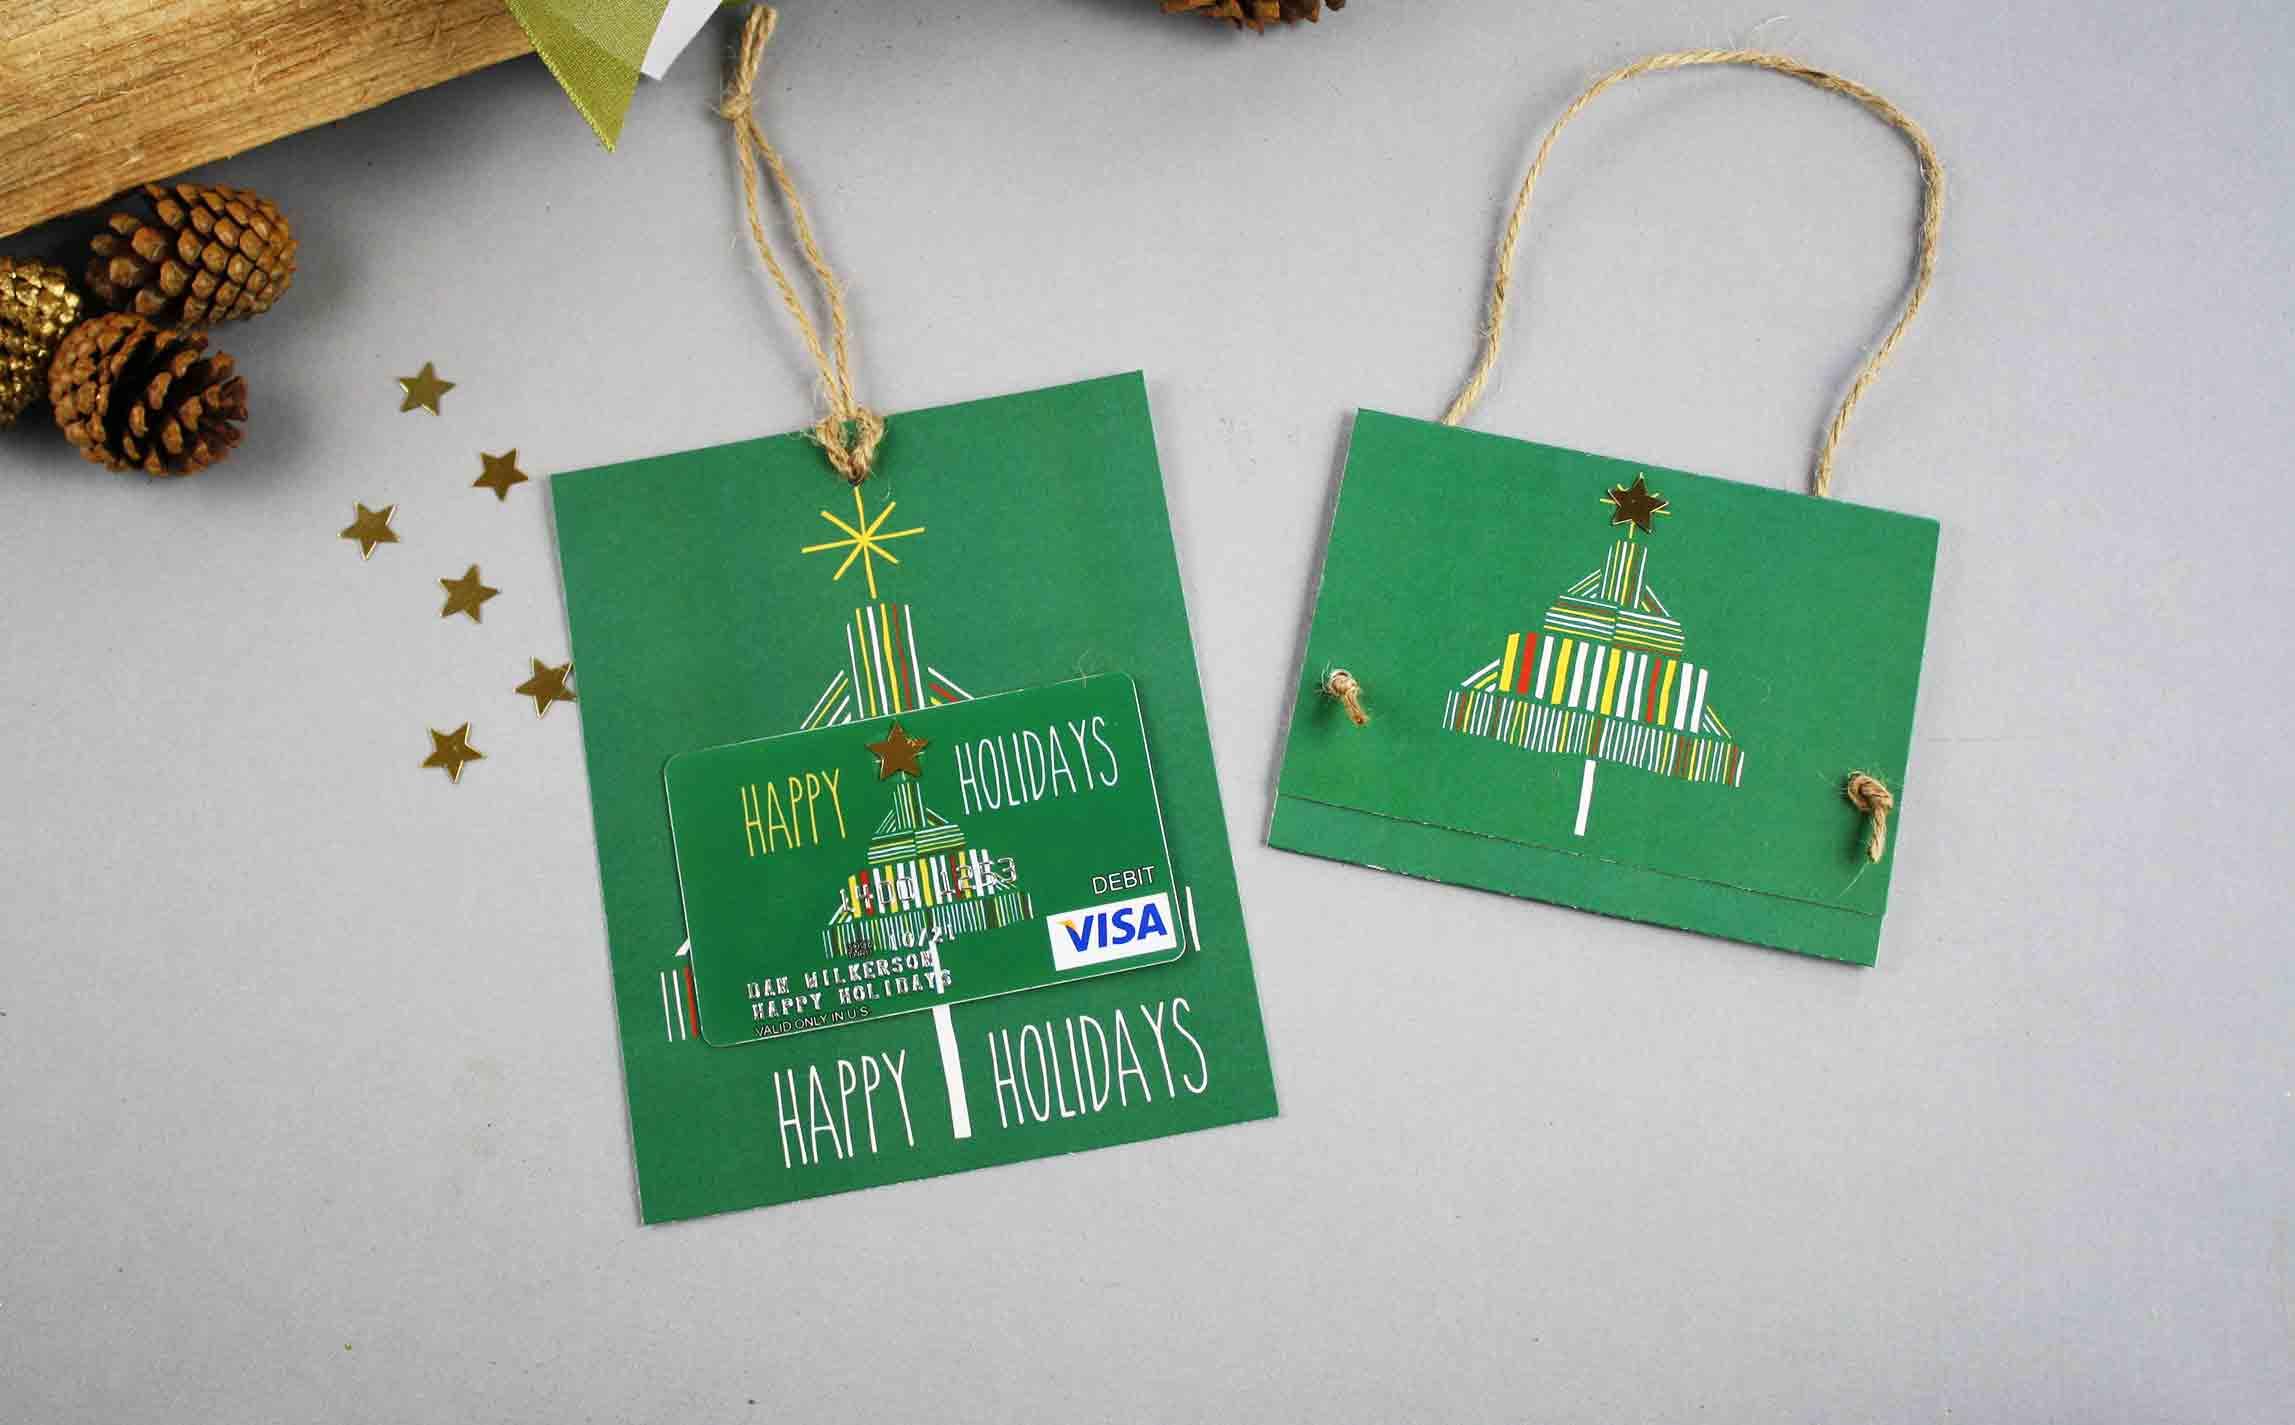 Free Gift Card Printable: Happy Holidays | Gcg - Make A Holiday Card For Free Printable